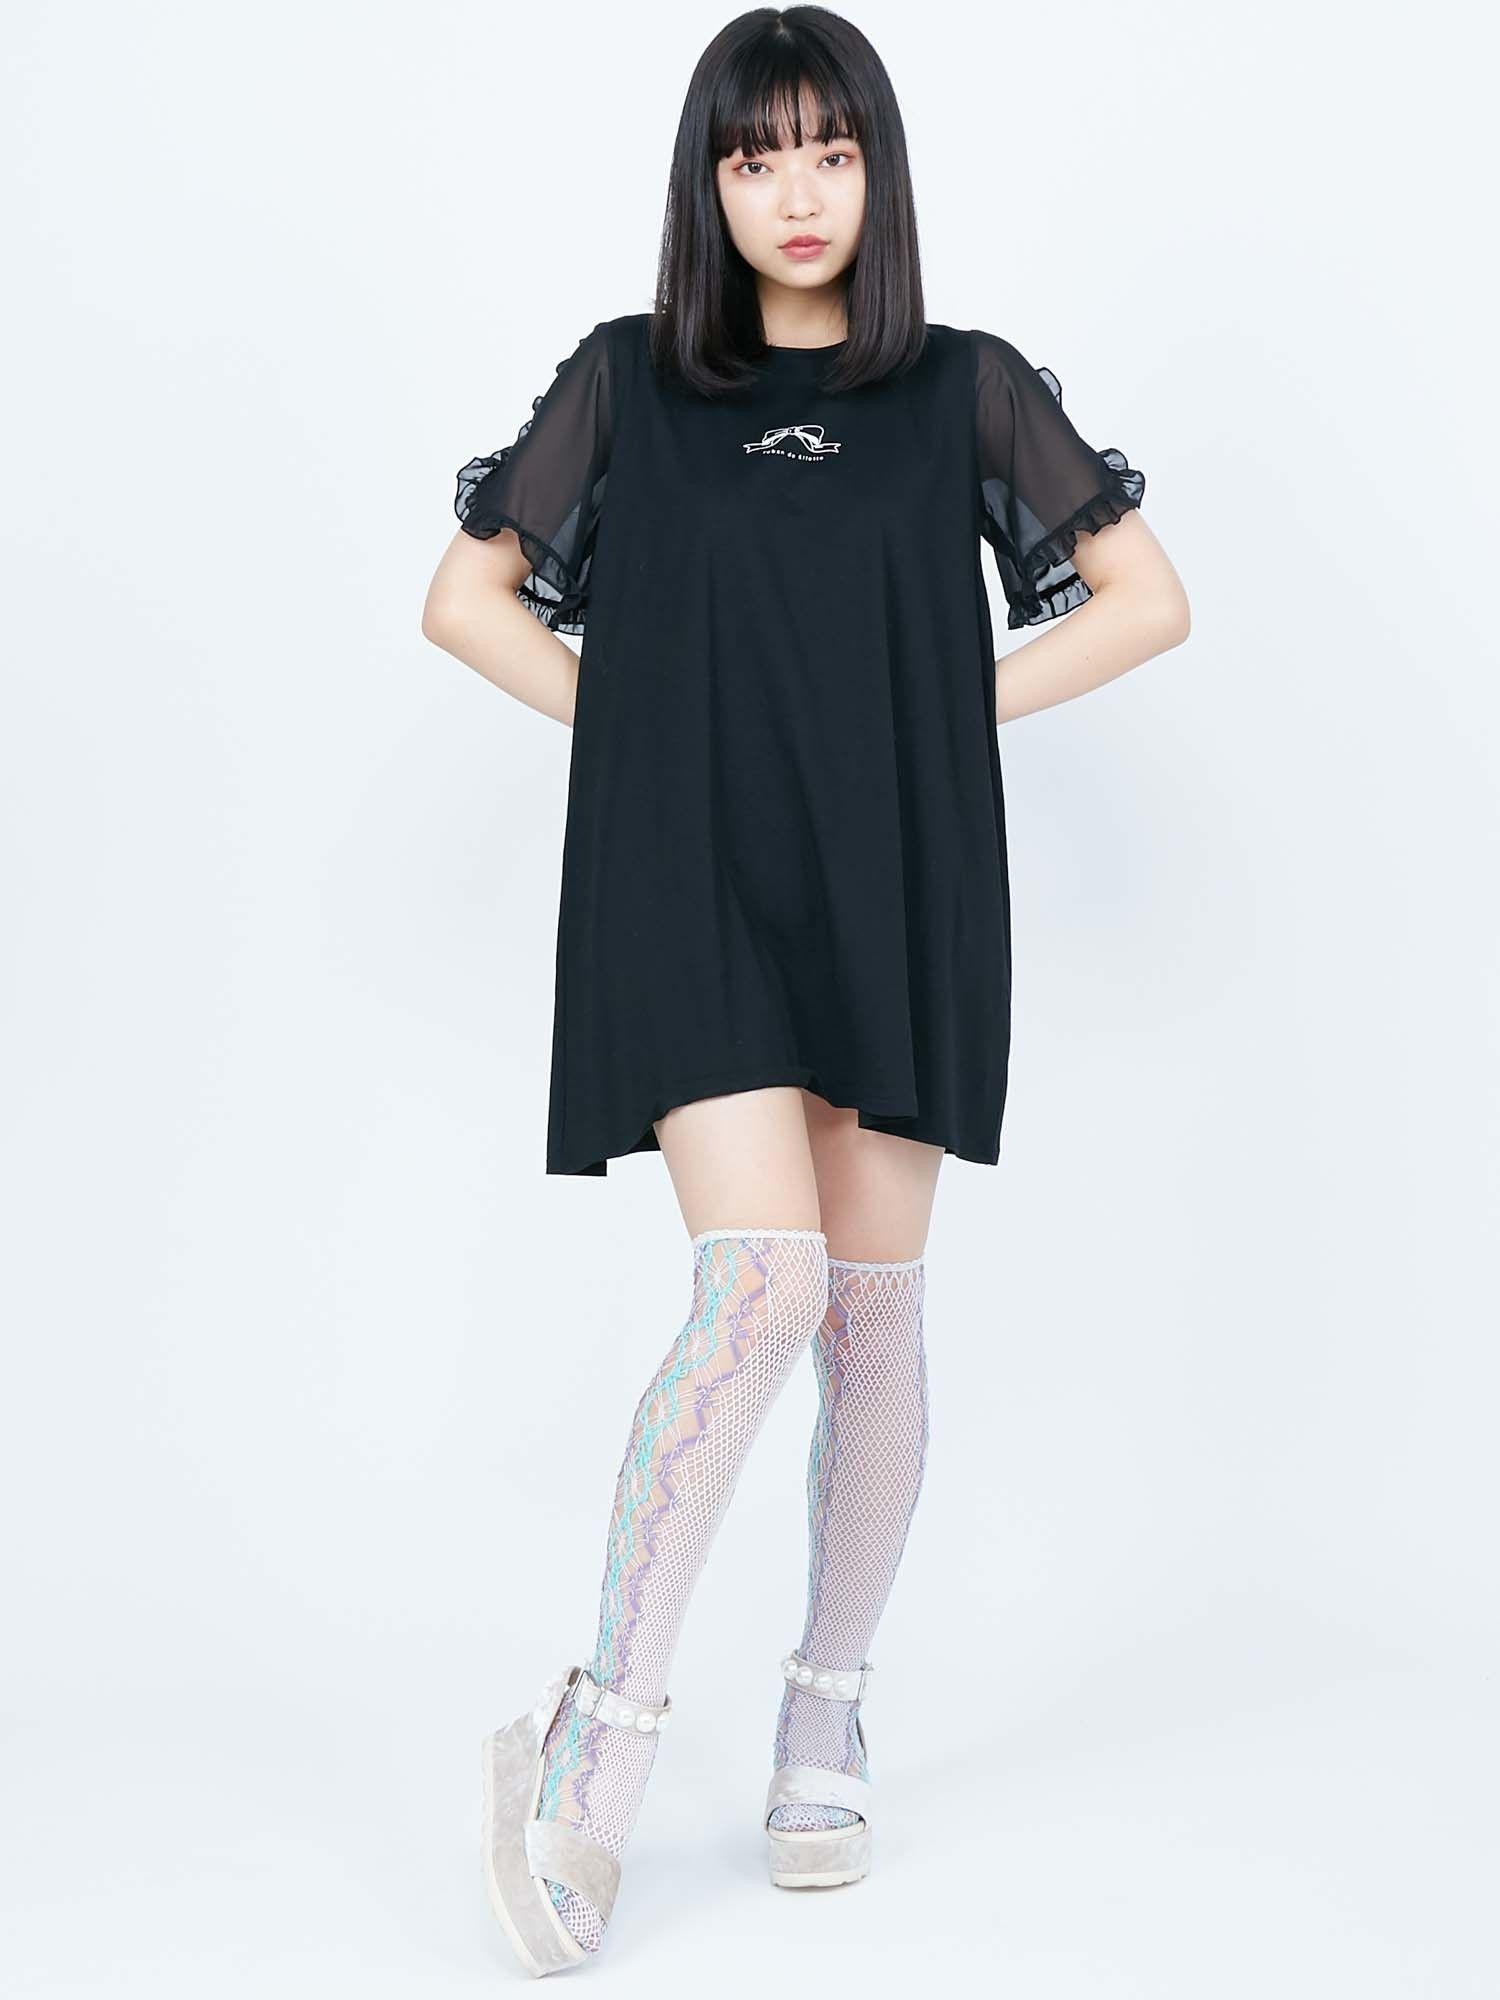 Chiffon sleeve tee dress